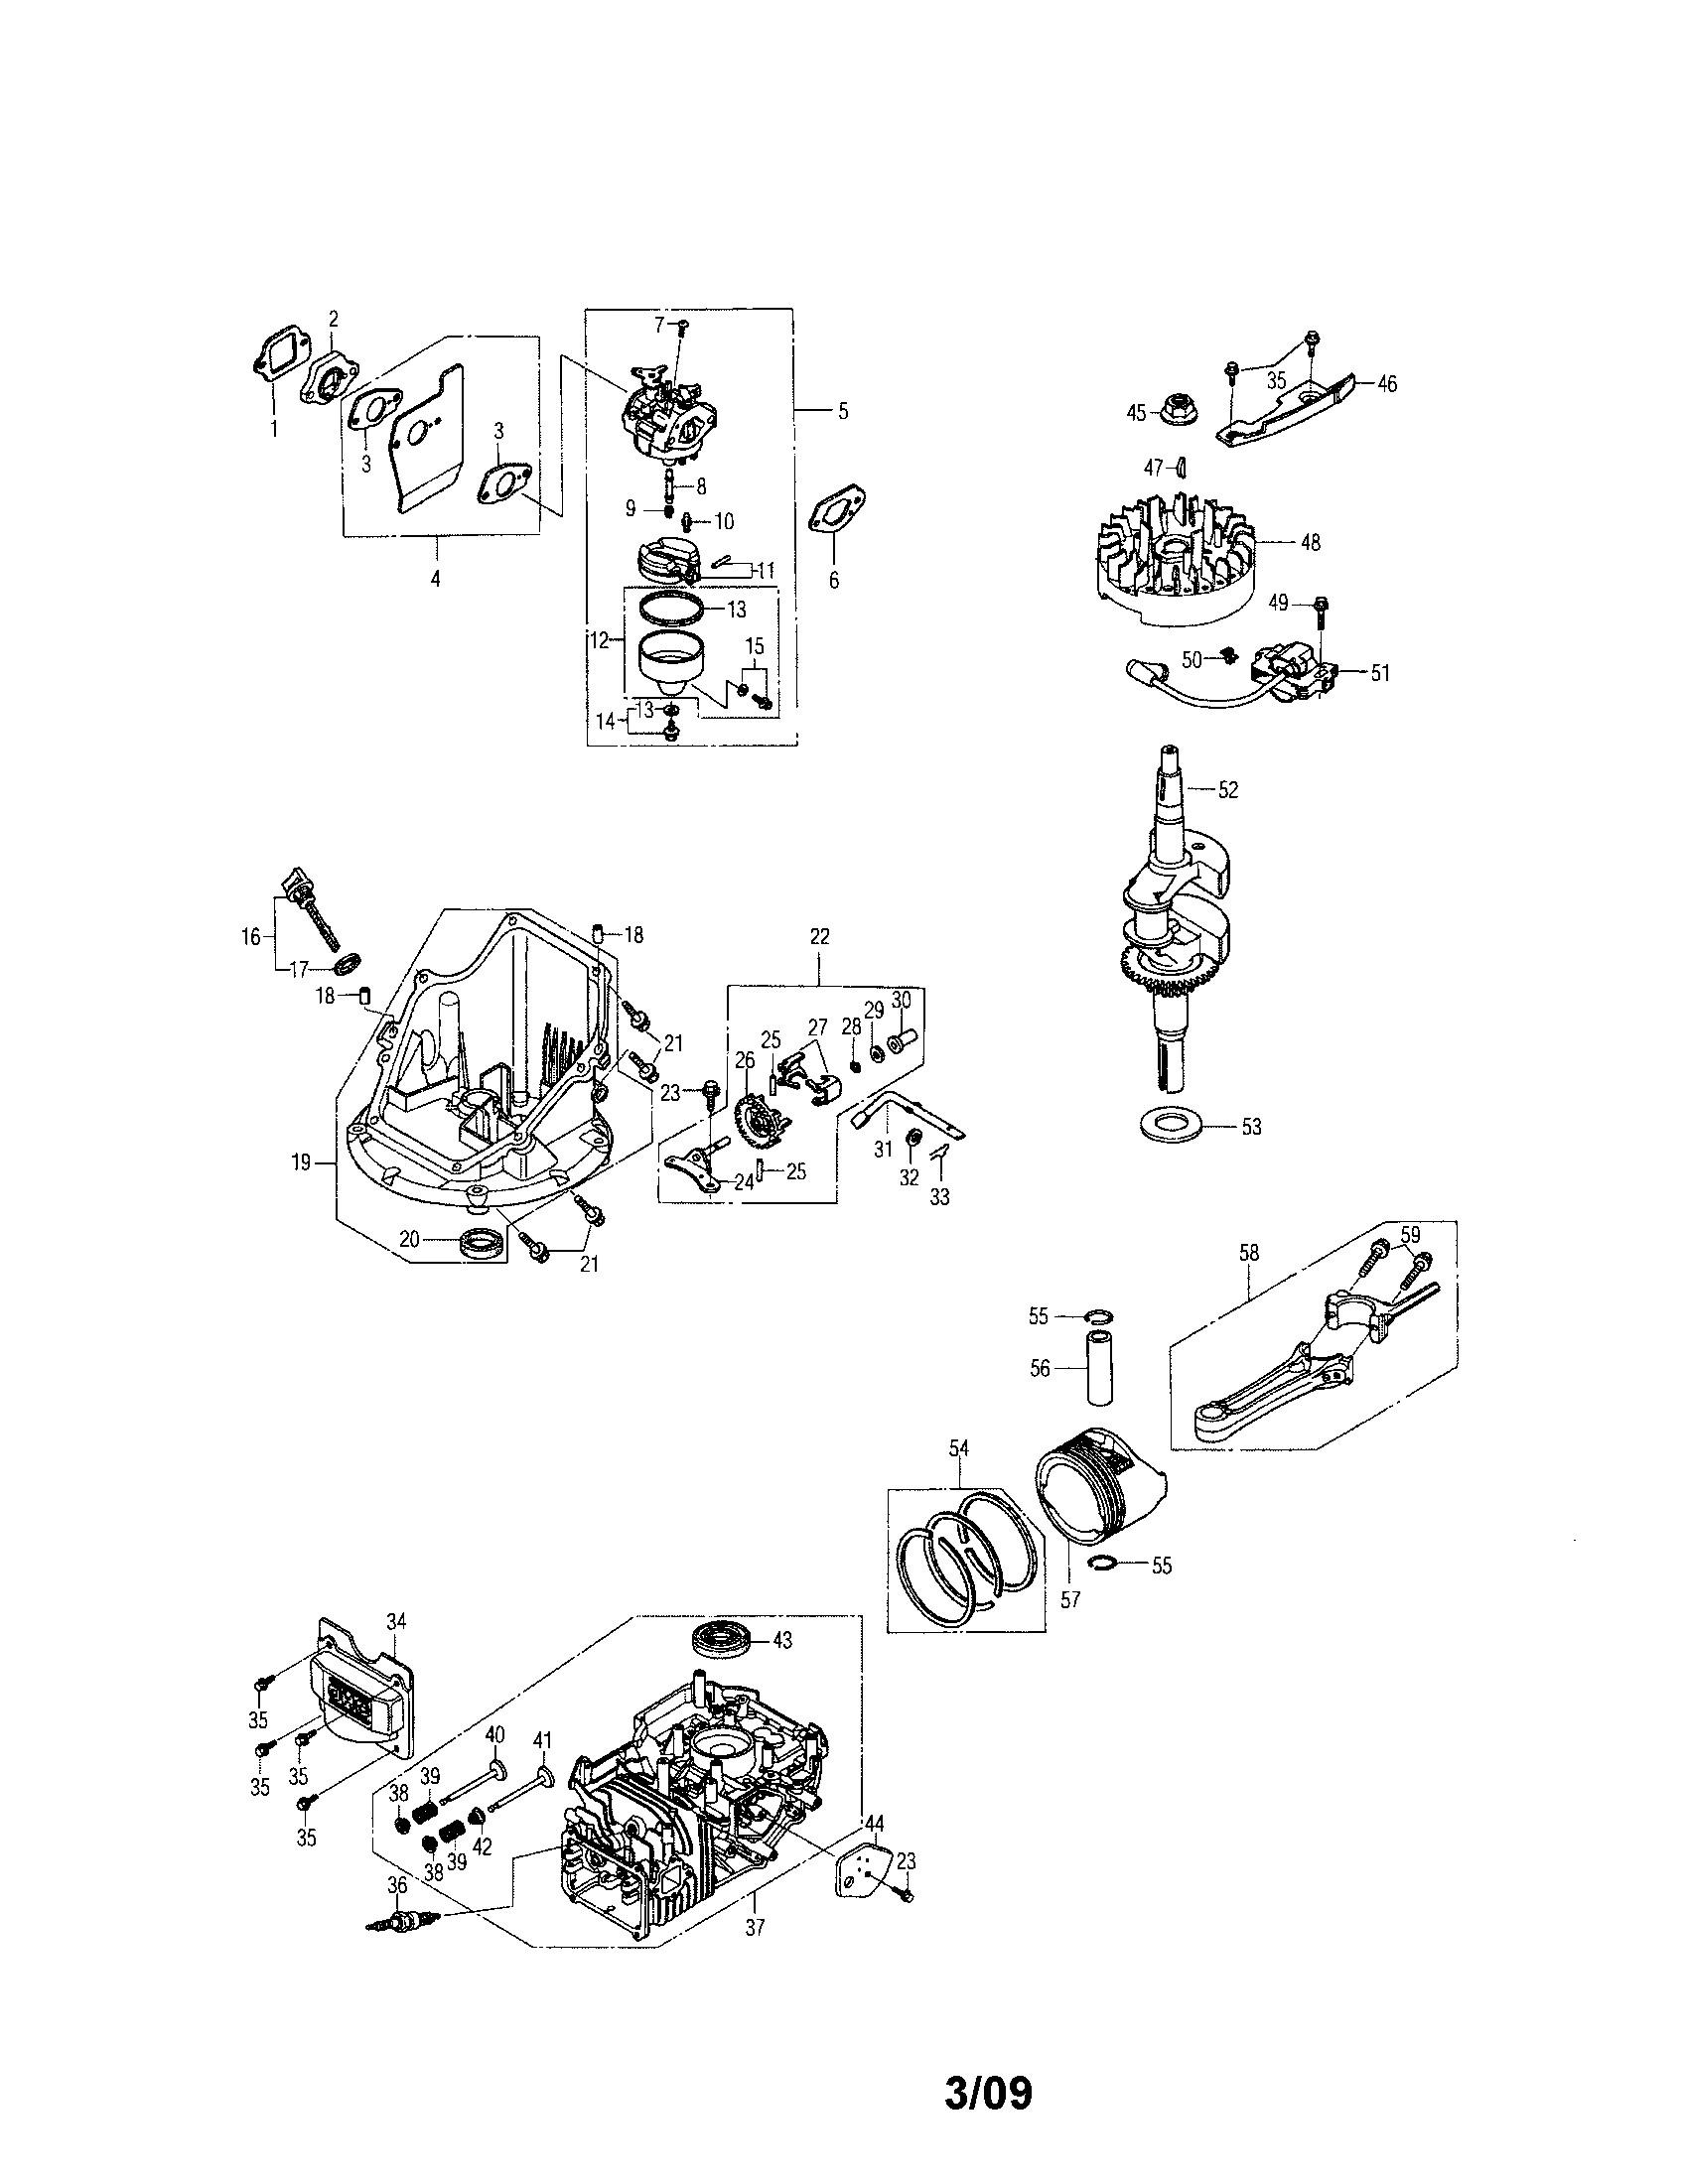 Honda Gc160 Parts Diagram